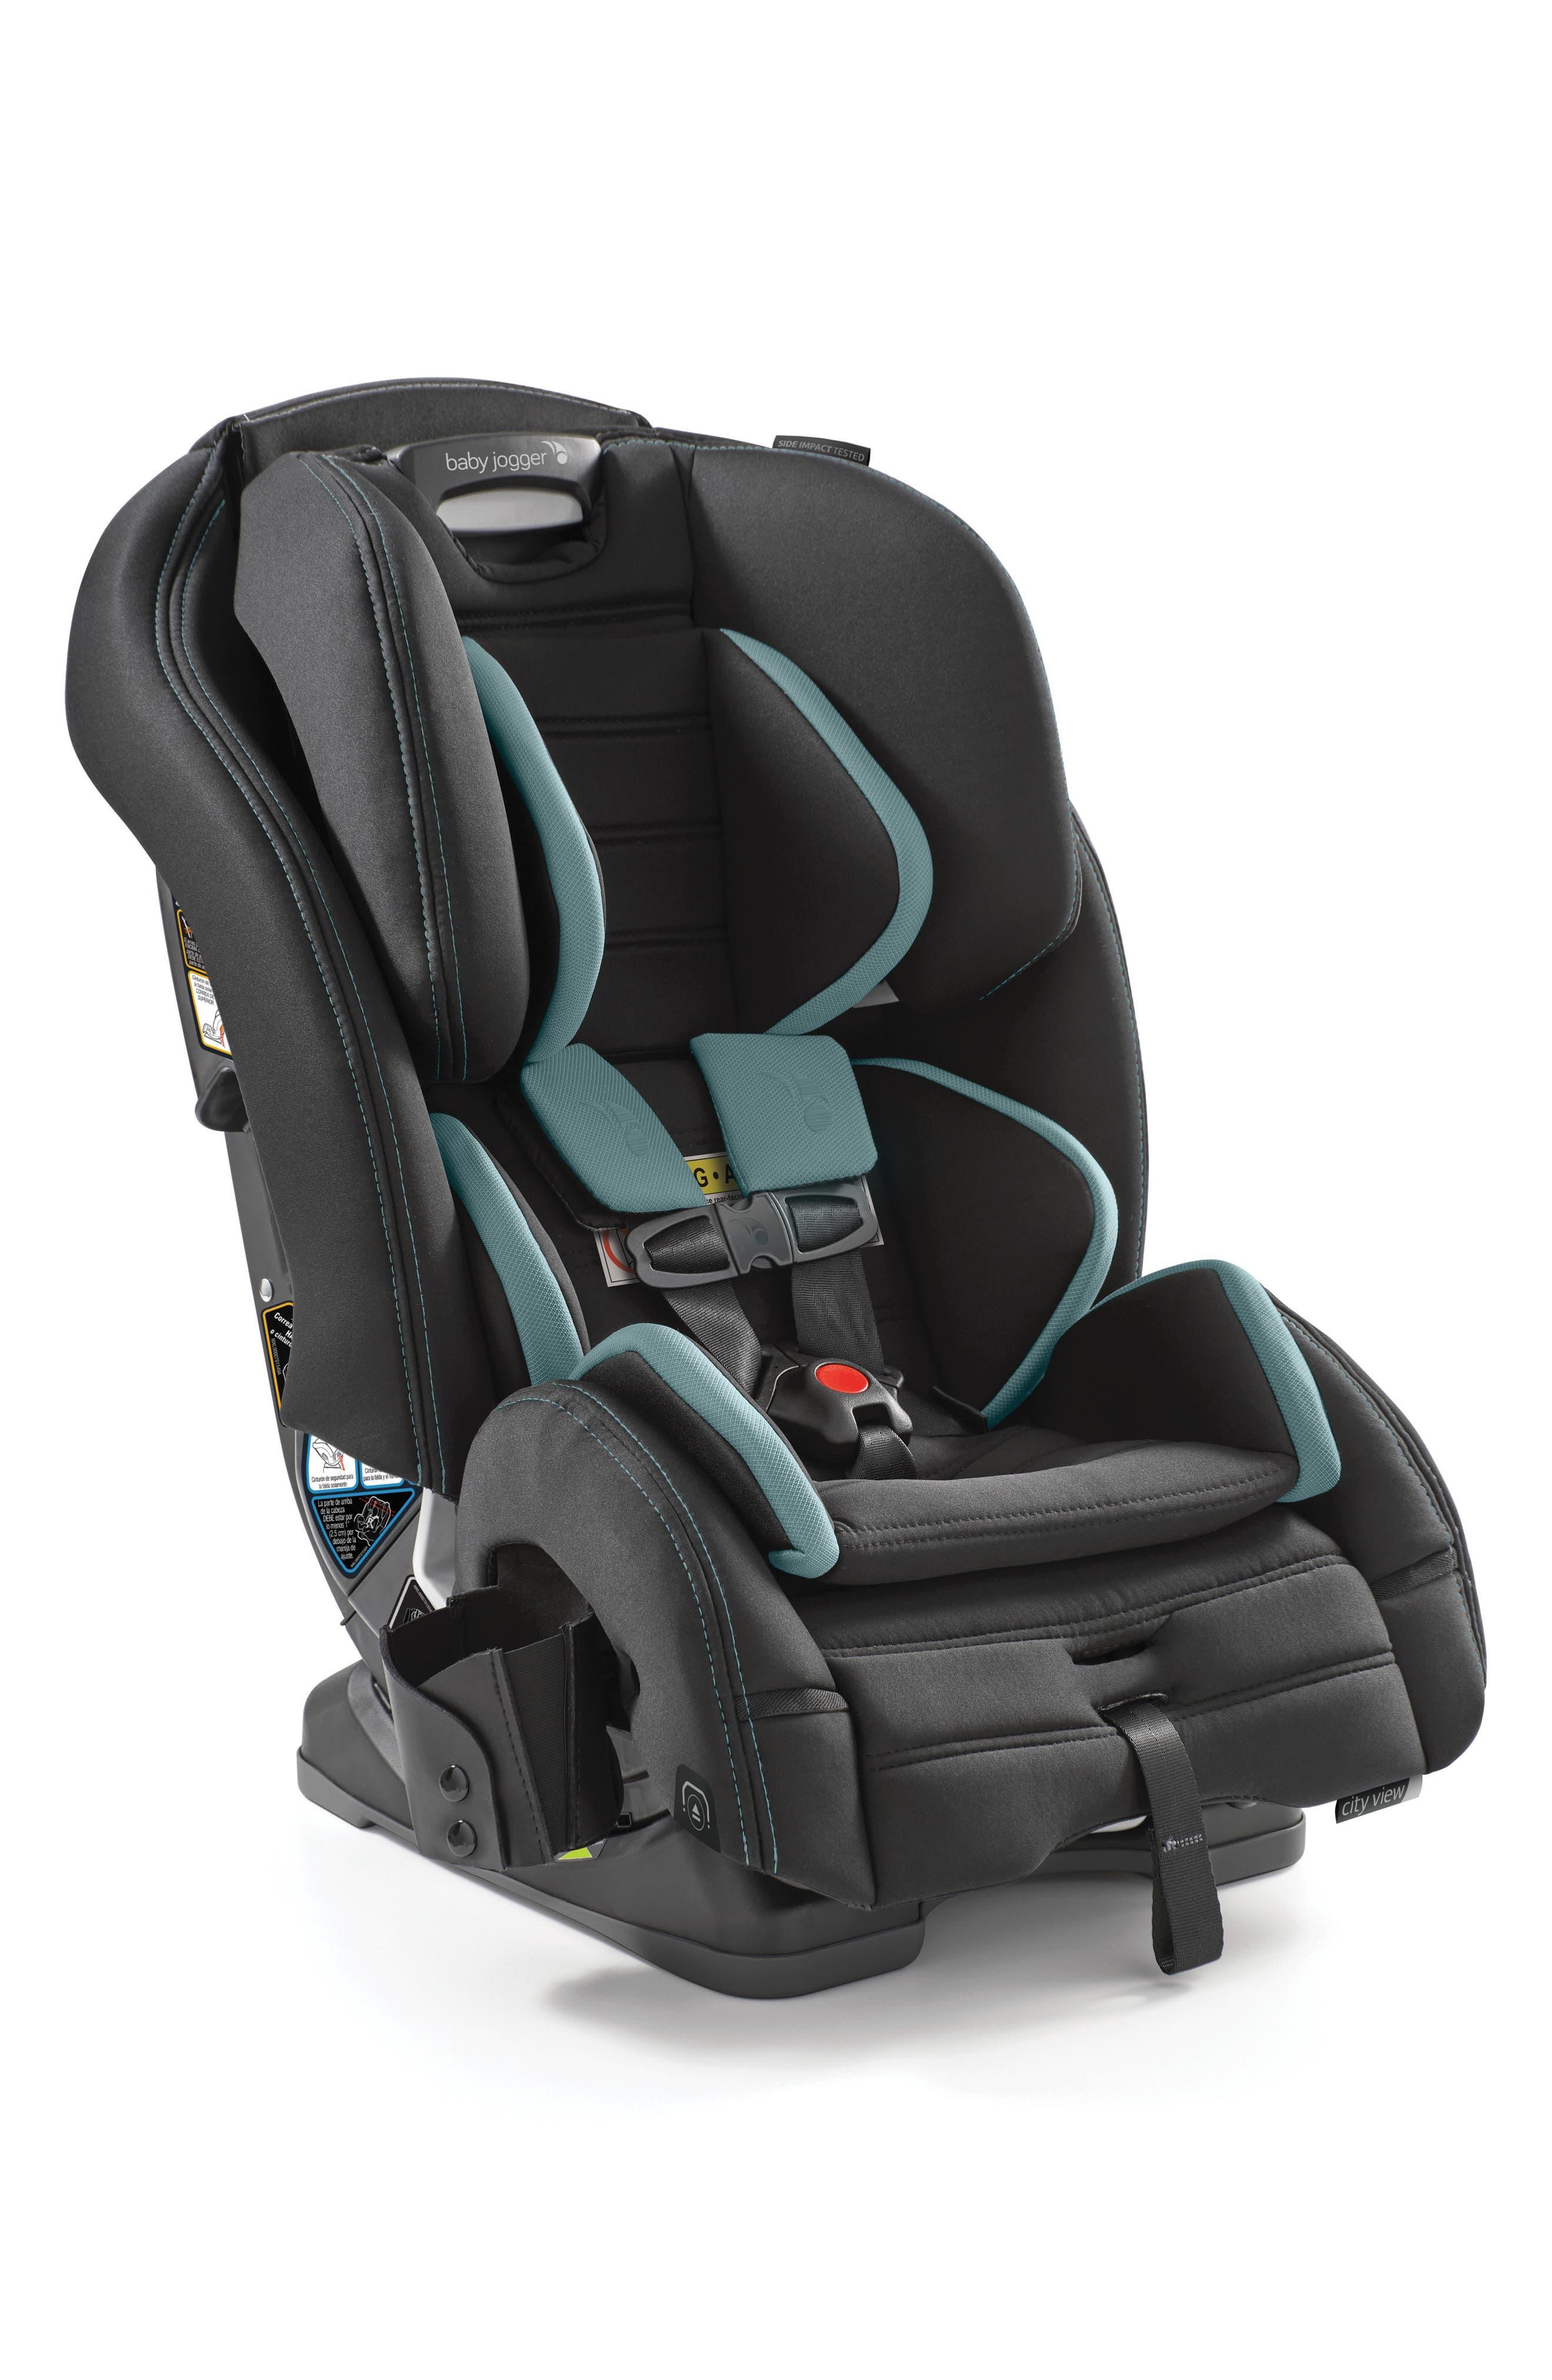 Baby Jogger City View 2018 Convertible Car Seat